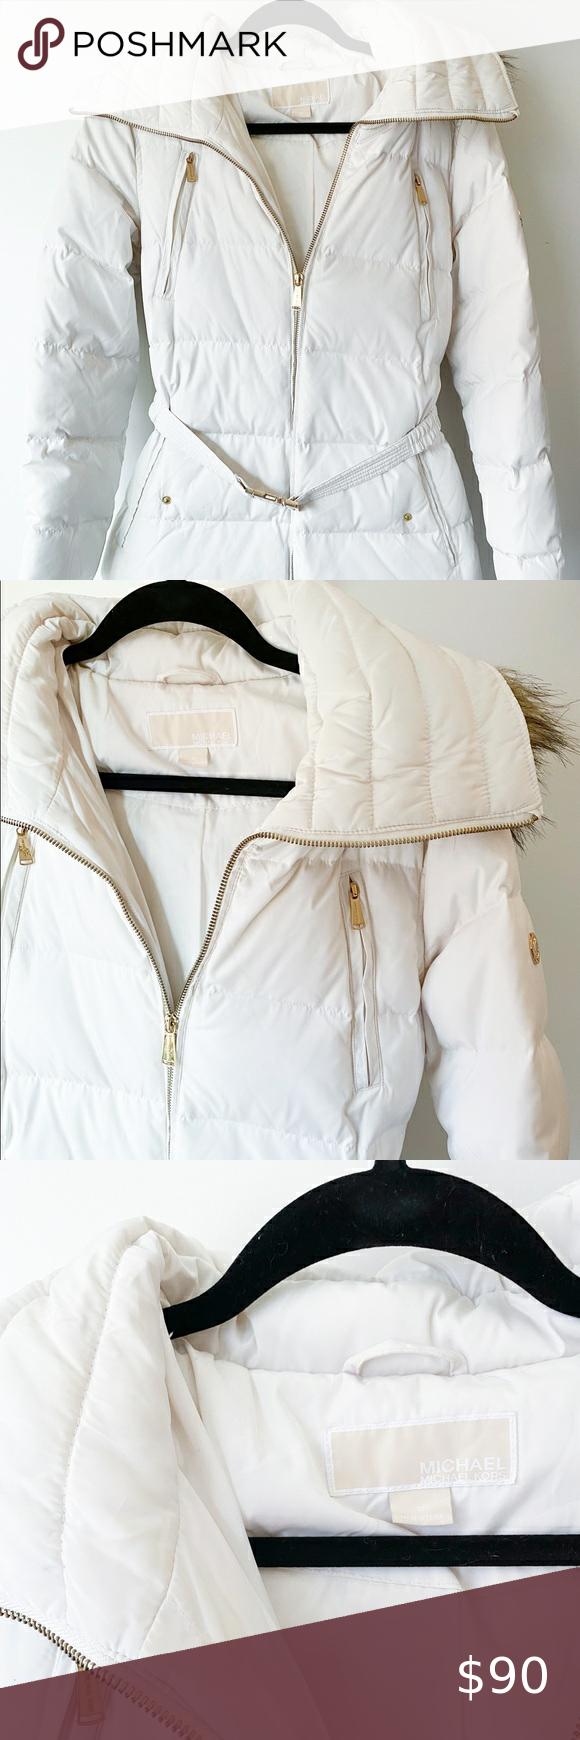 Michael Kors Belted Puffer Coat With Faux Fur Hood Faux Fur Hood Michael Kors Puffer Coat Puffer Coat [ 1740 x 580 Pixel ]